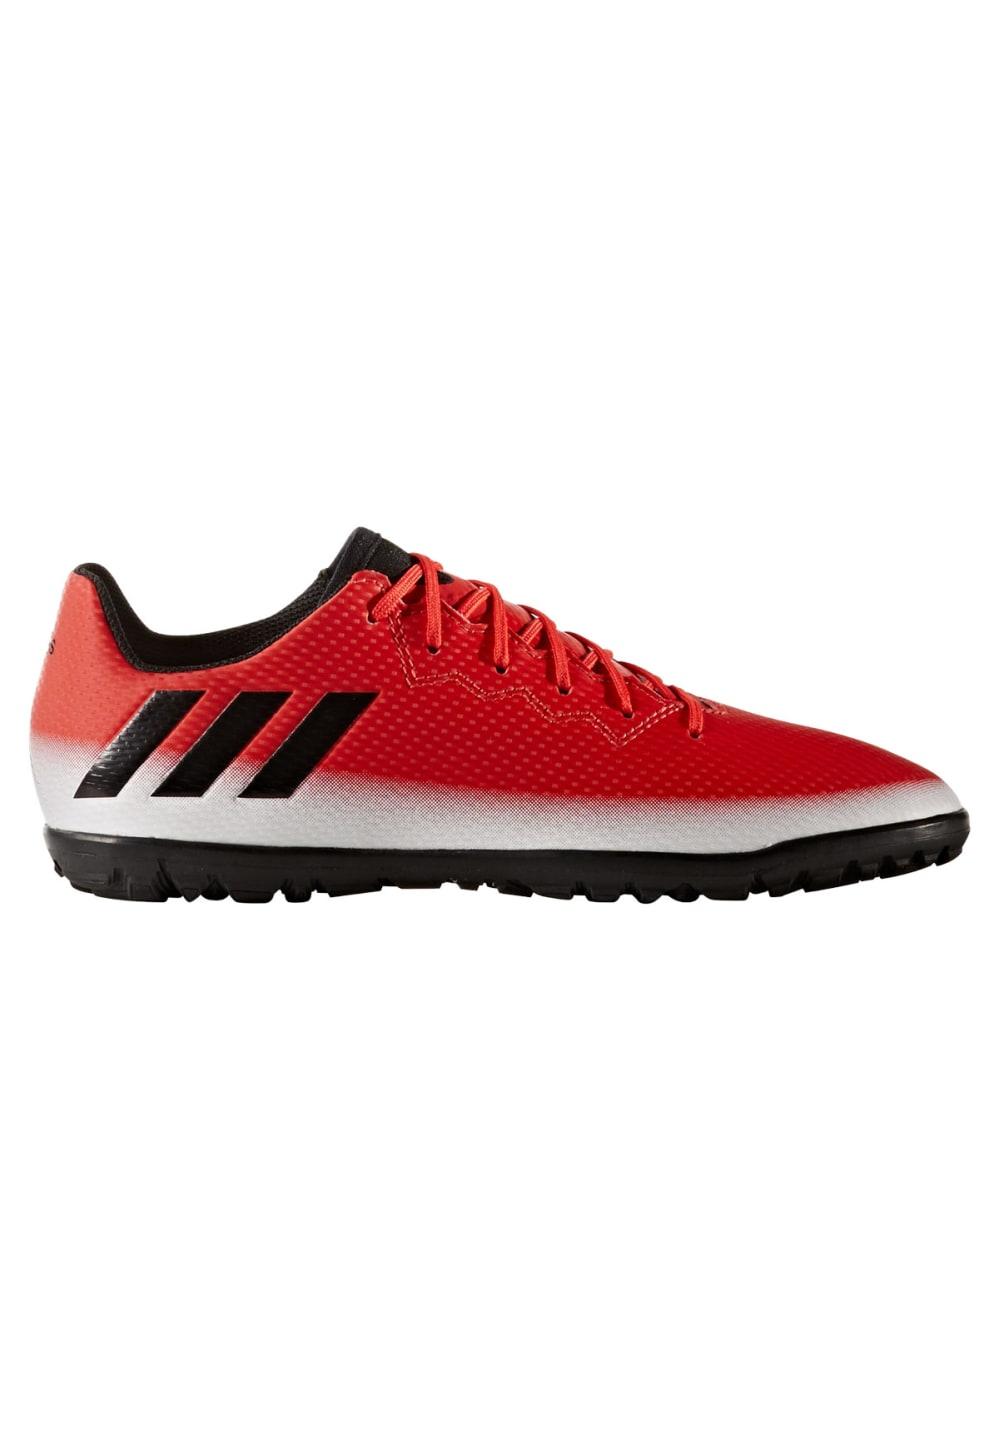 watch 969b3 adcdf adidas-messi-16-3-tf-j-fussballschuhe-kinder-unisex -rot-pid-000000000010124145.jpg